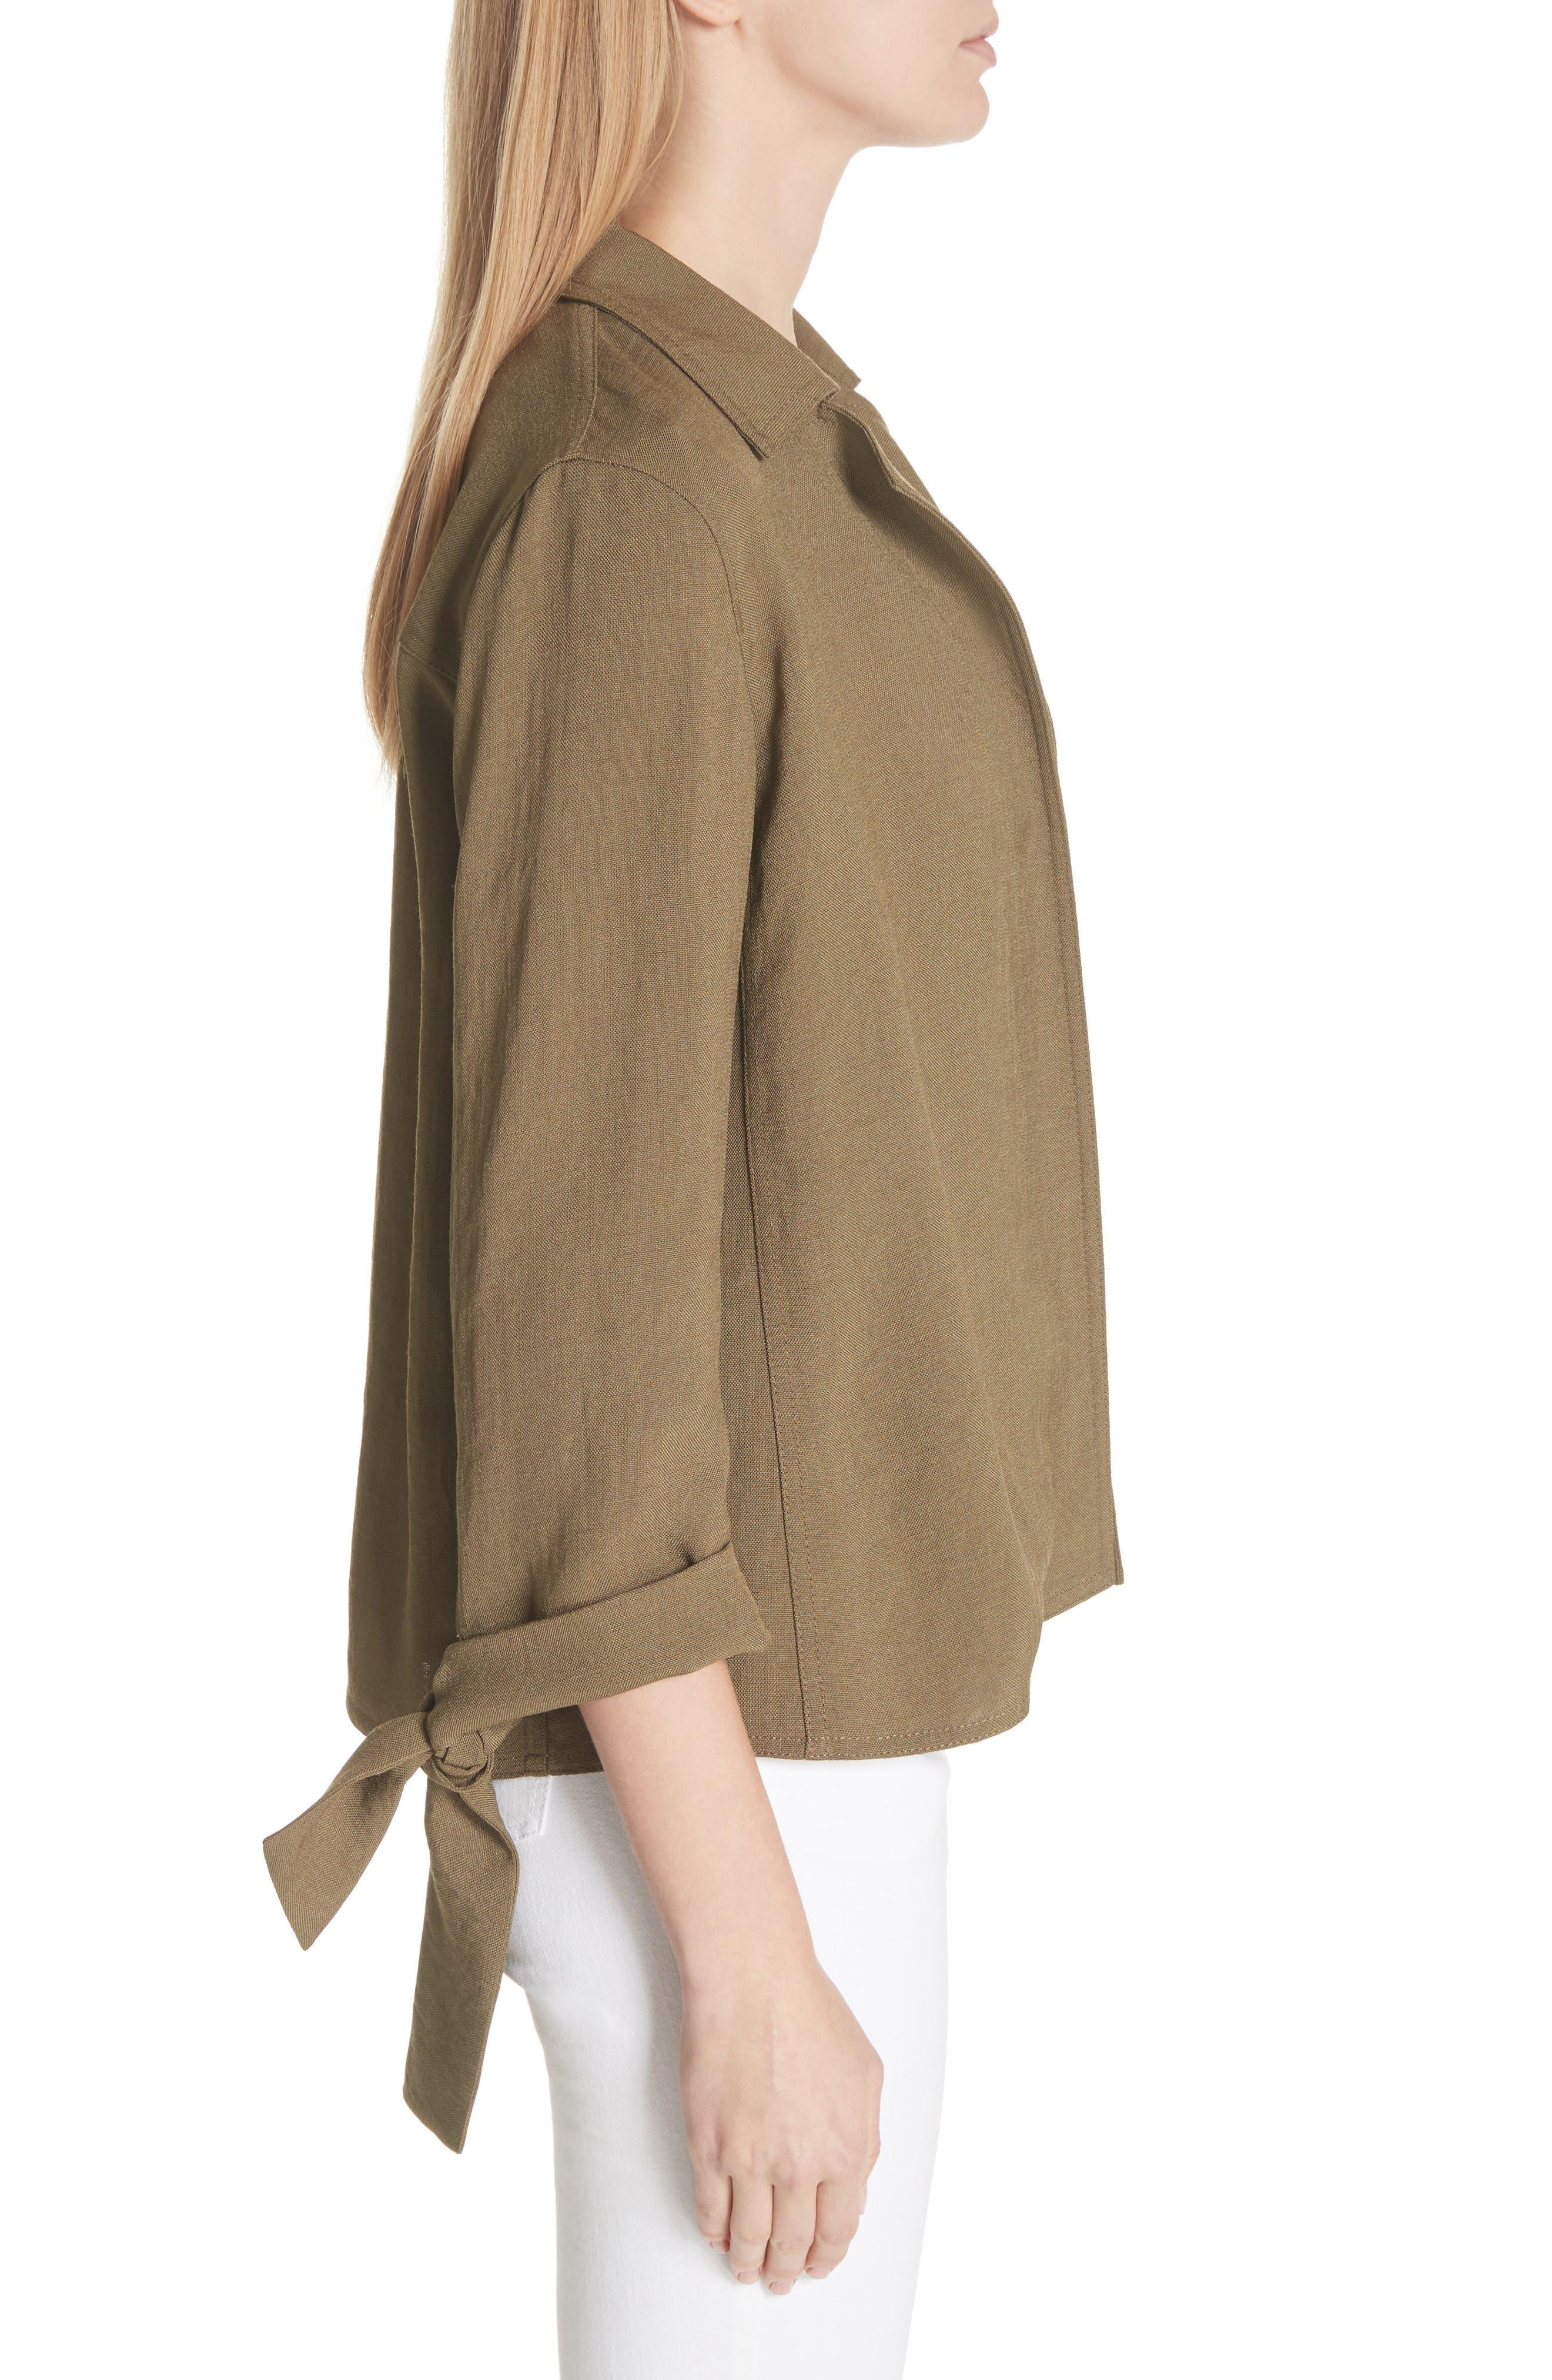 Grant Altruistic Cloth Jacket,                             Alternate thumbnail 3, color,                             342